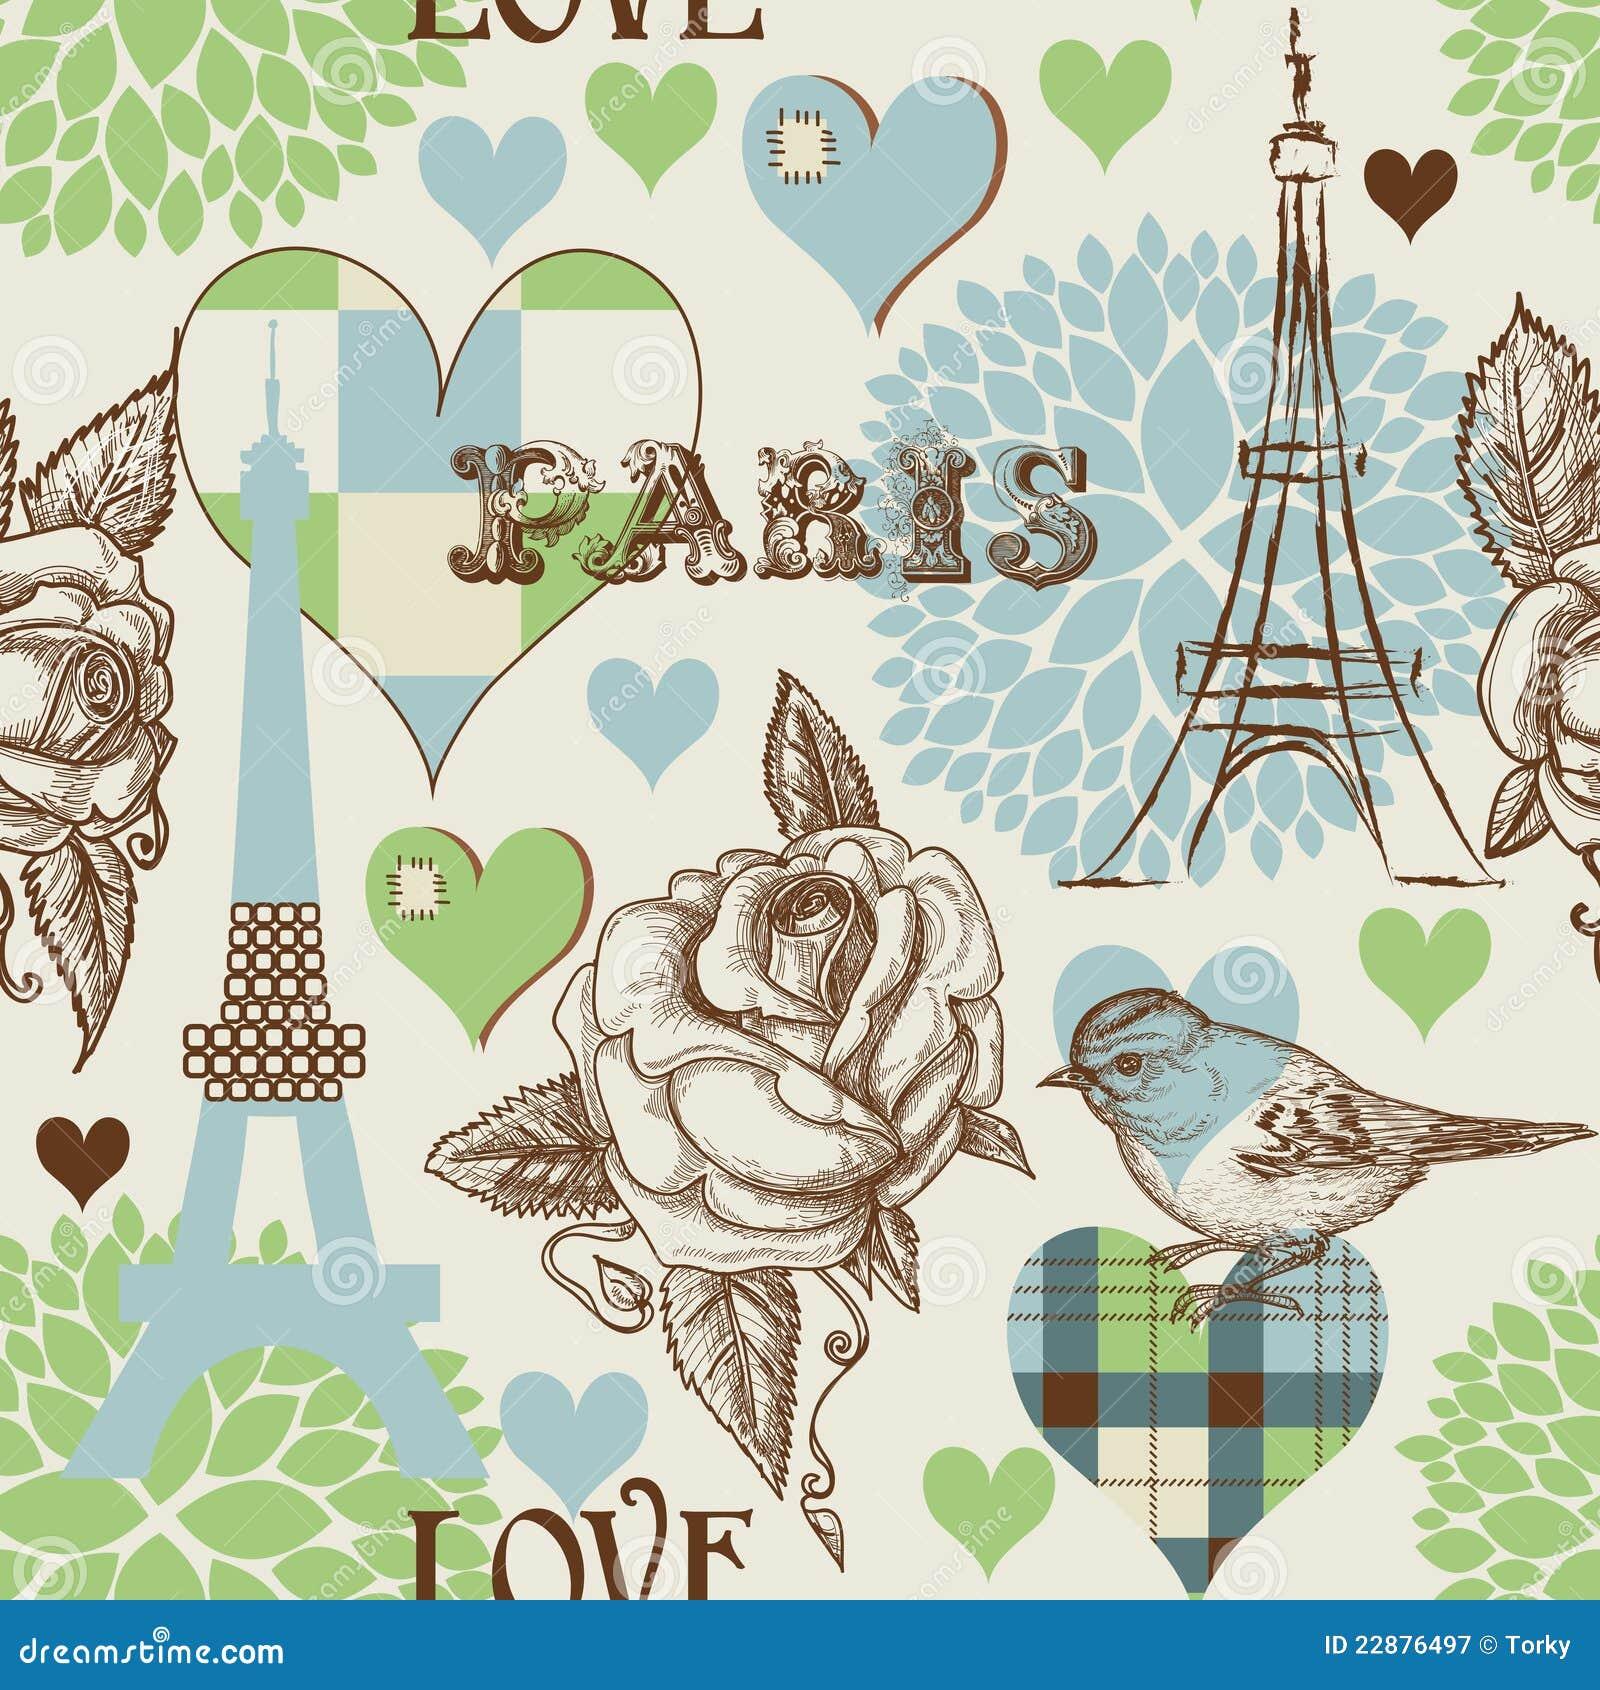 Old paris street map royalty free stock photo image 15885665 - Paris Seamless Pattern Royalty Free Stock Photography